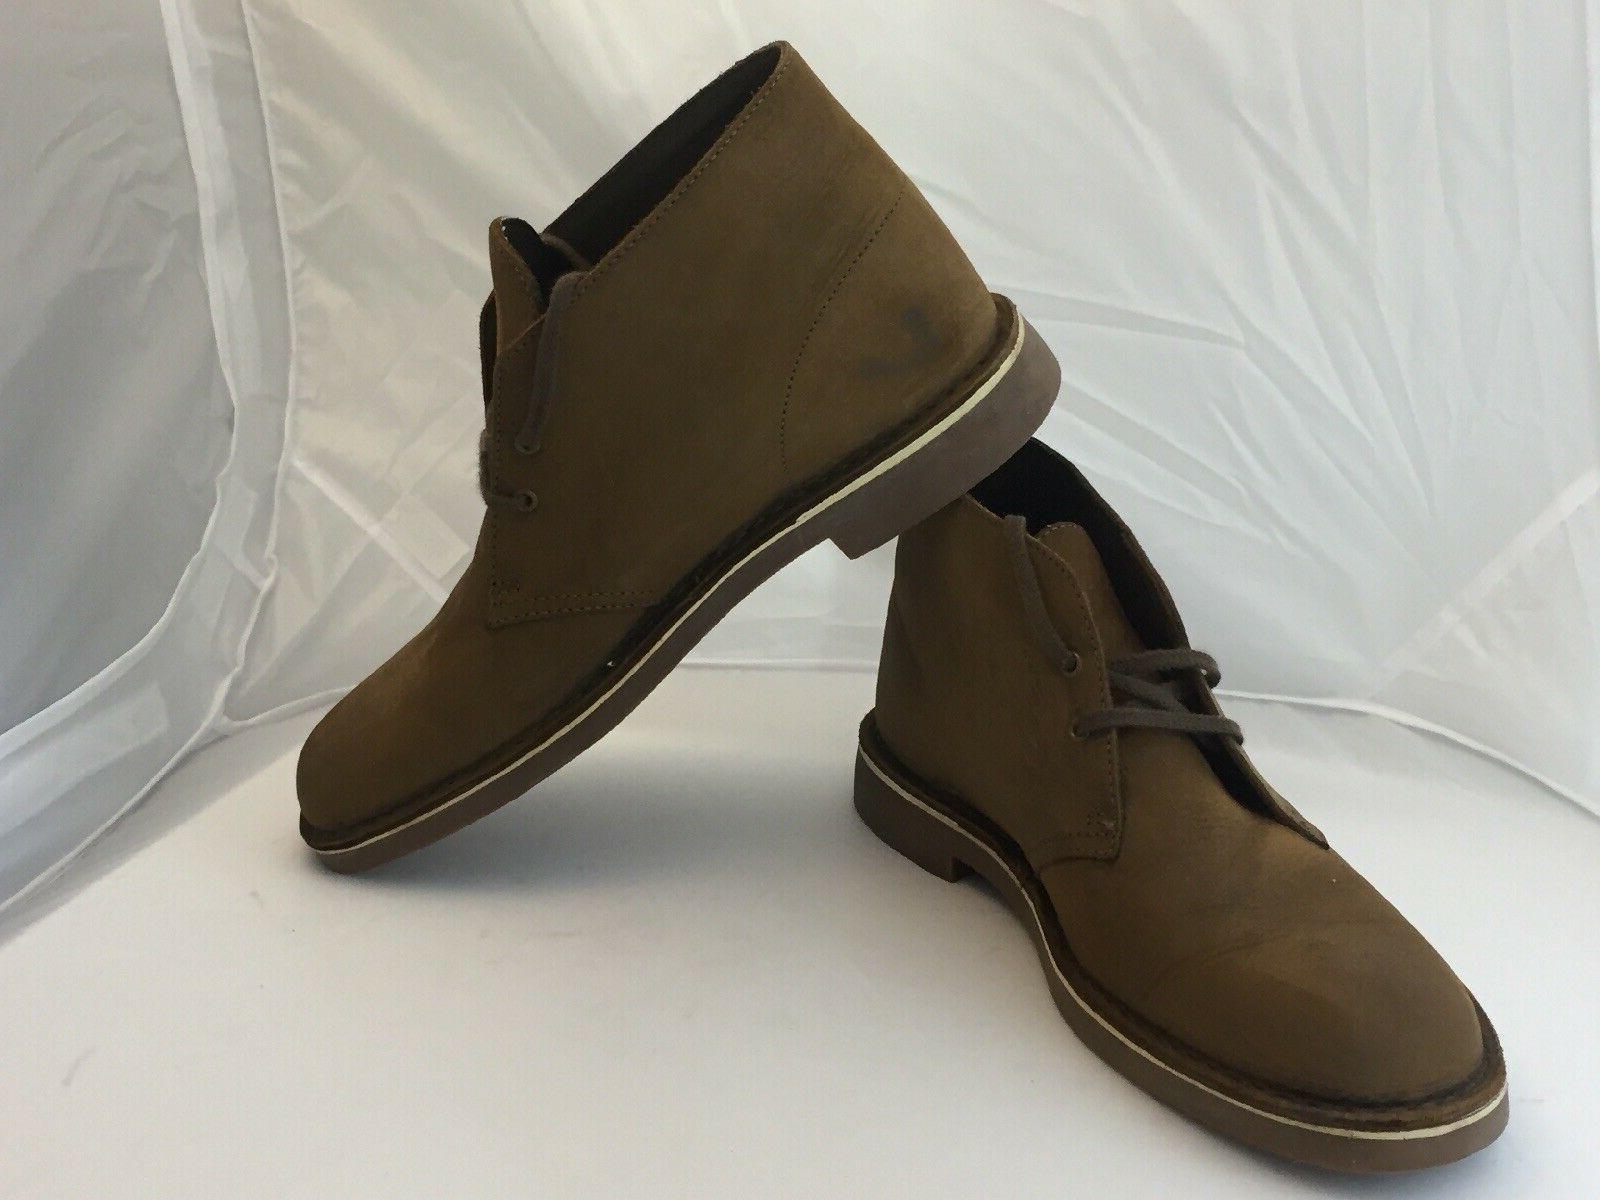 Clarks Originals Brown 15250 Men Size 9.5M